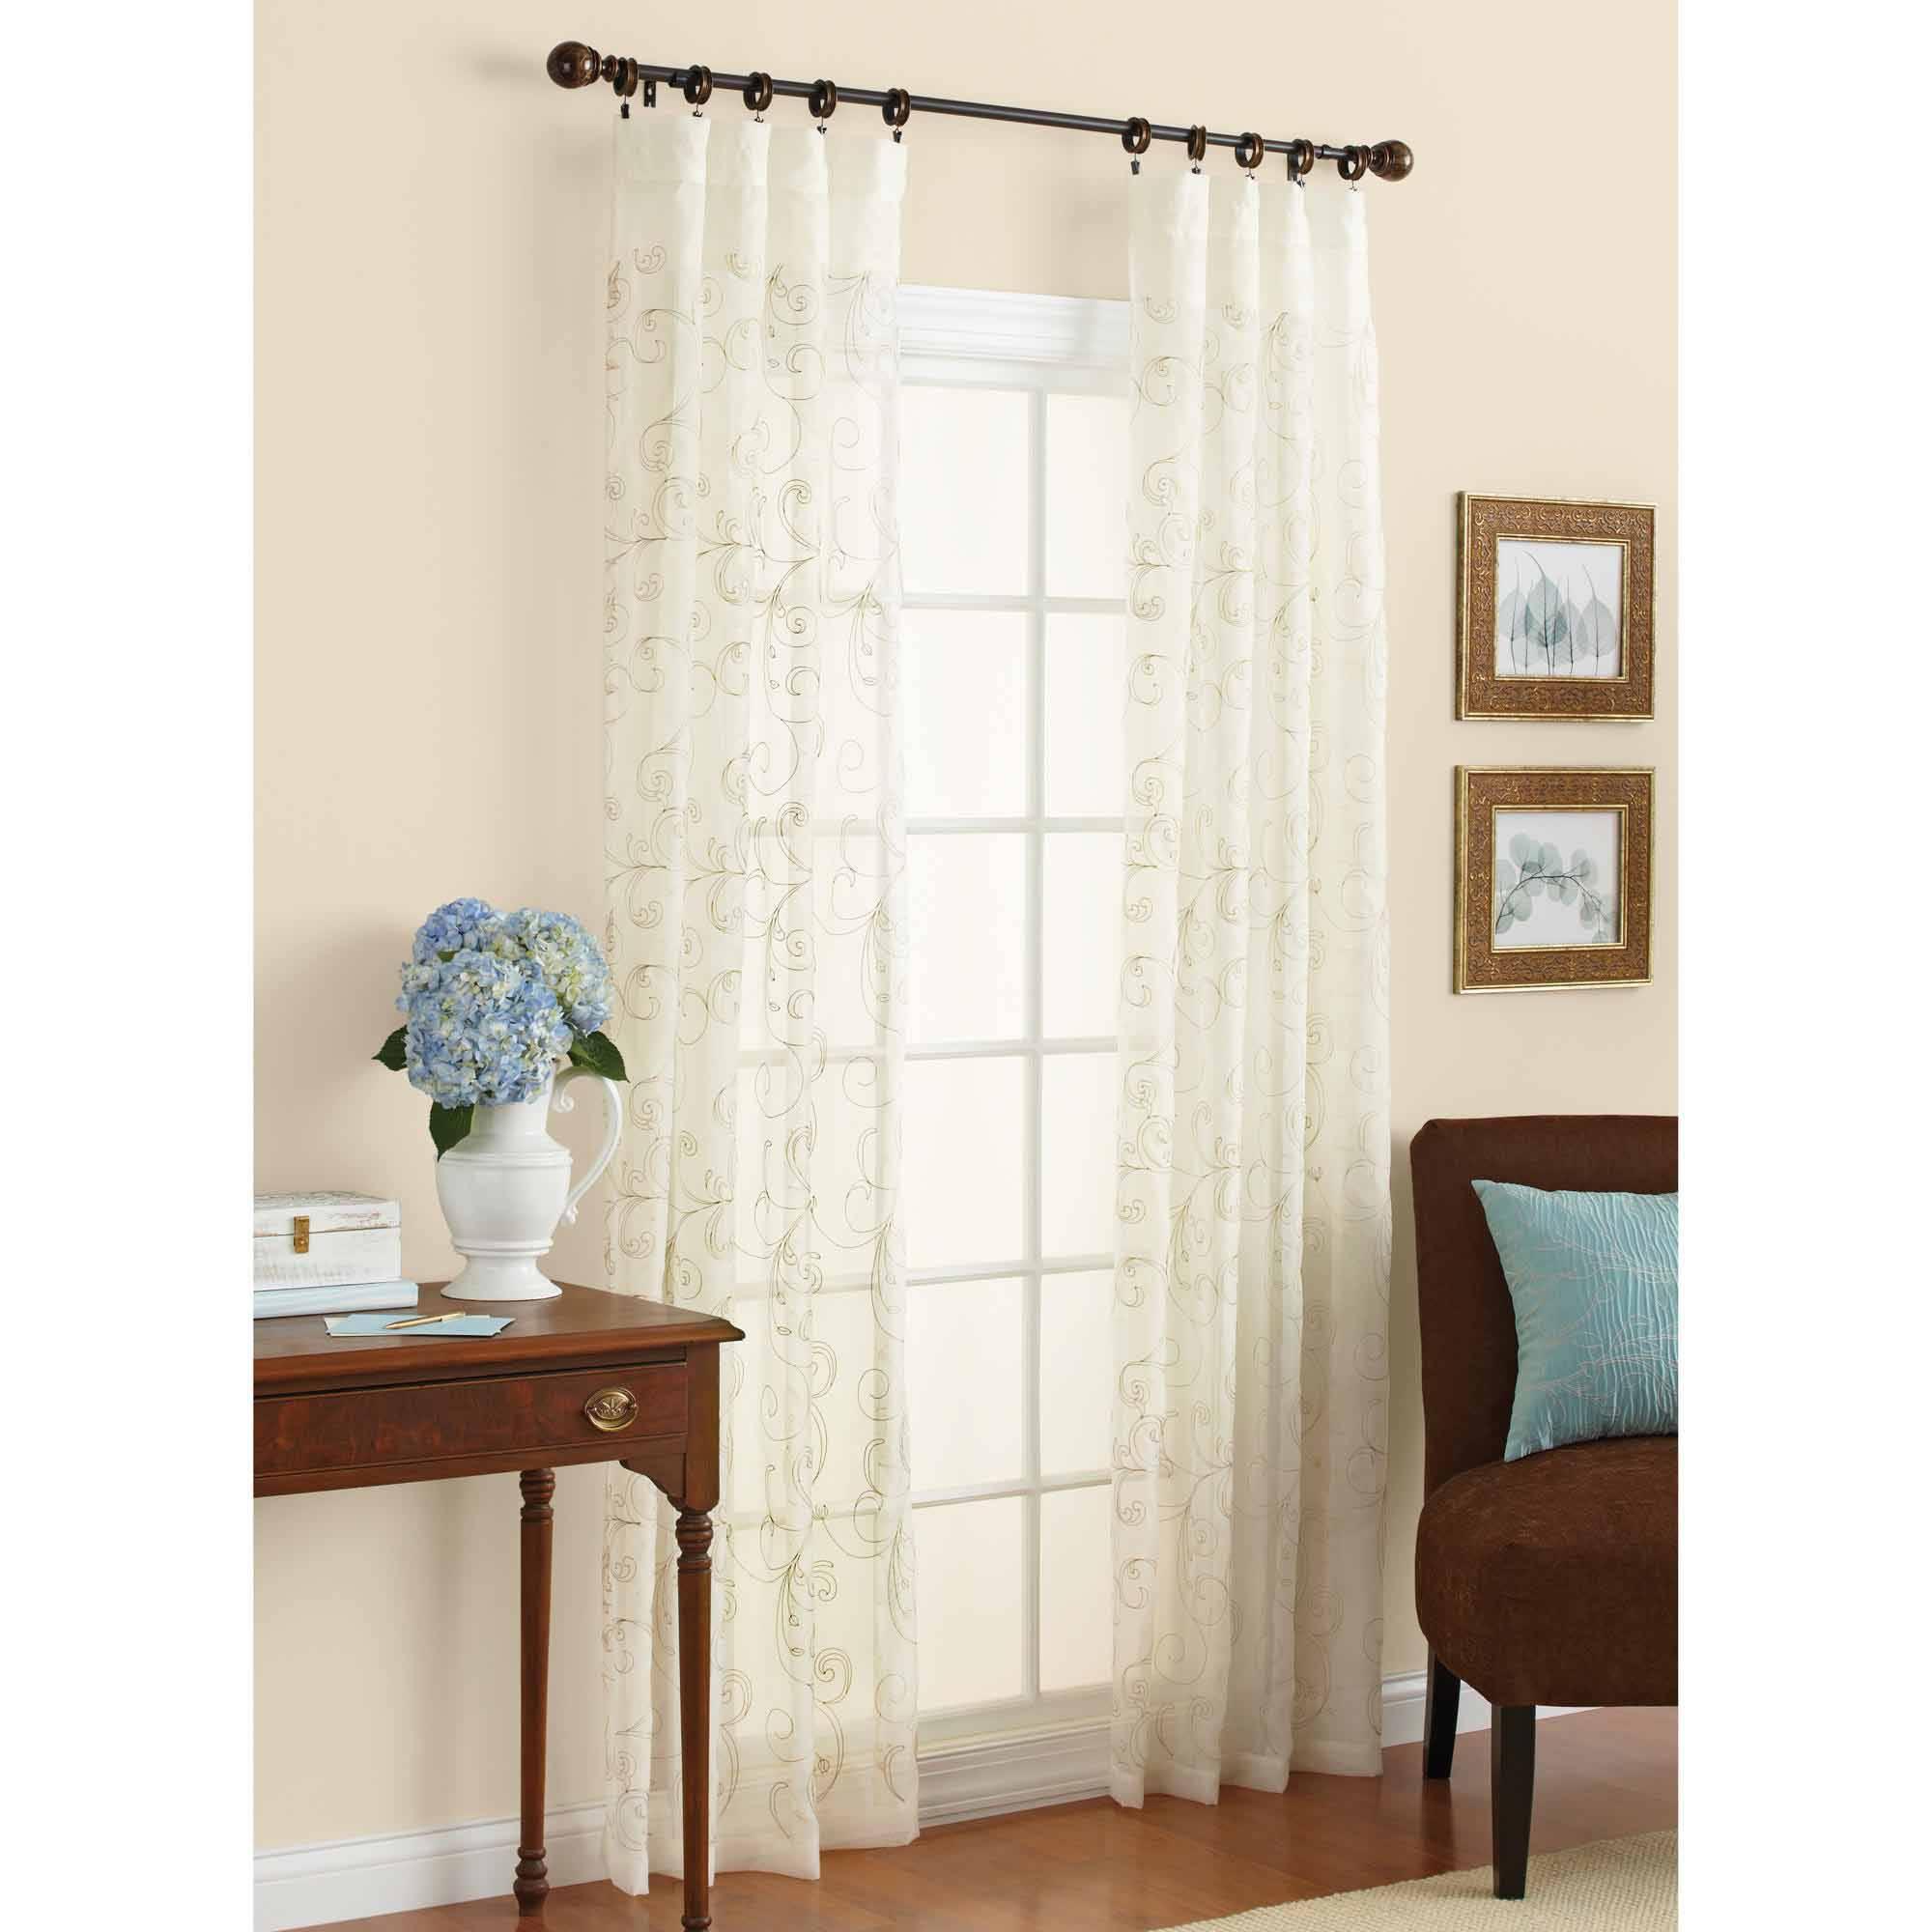 Better Homes & Gardens Embroidered Sheer Curtain Panel - Walmart.com